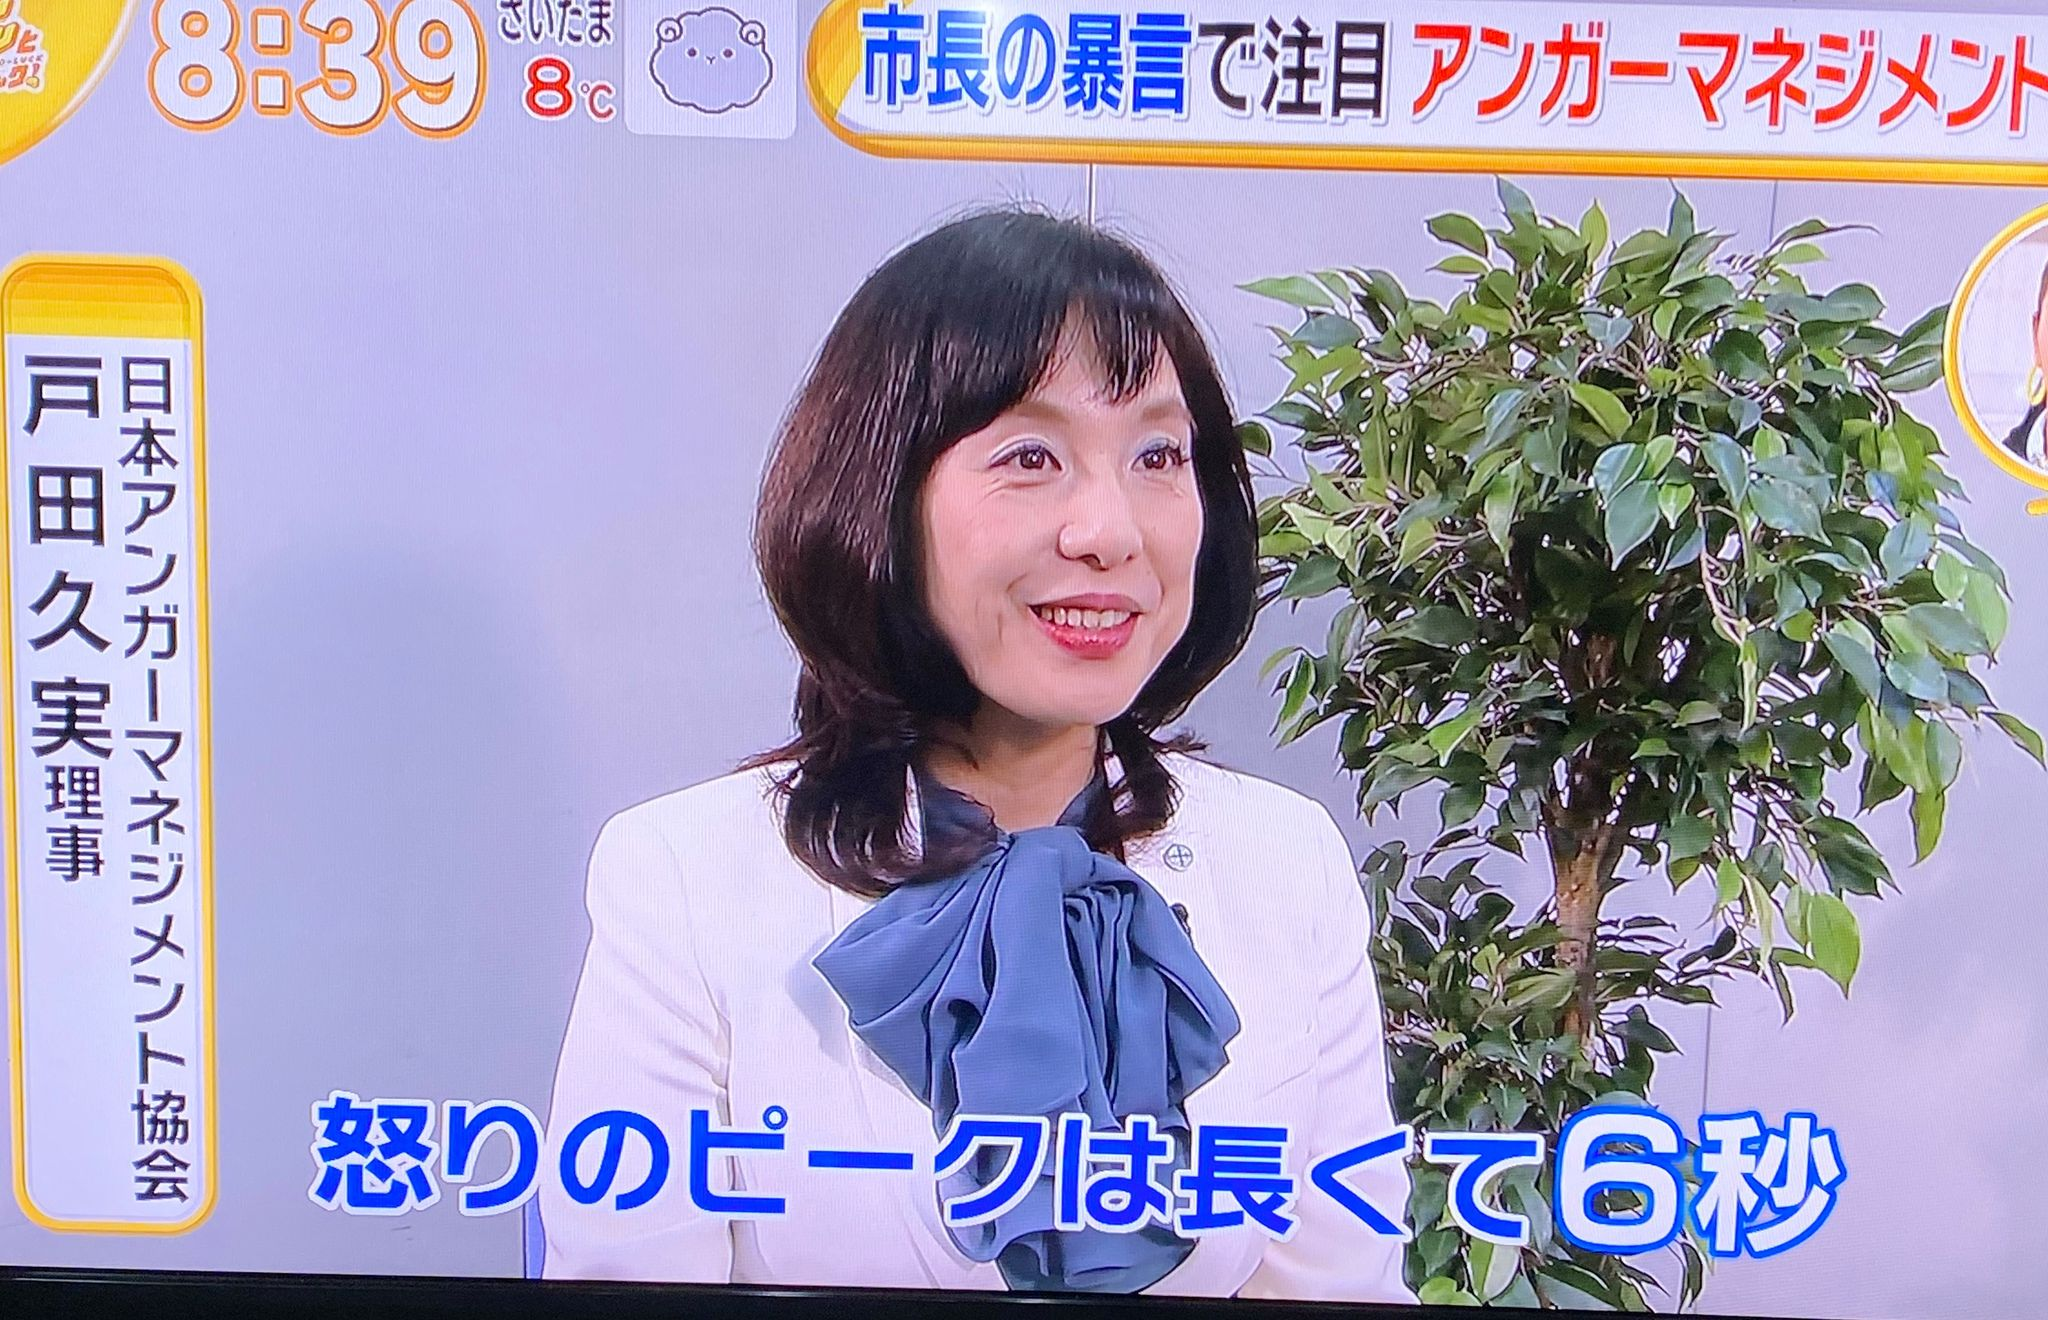 TBS『グッとラック!』